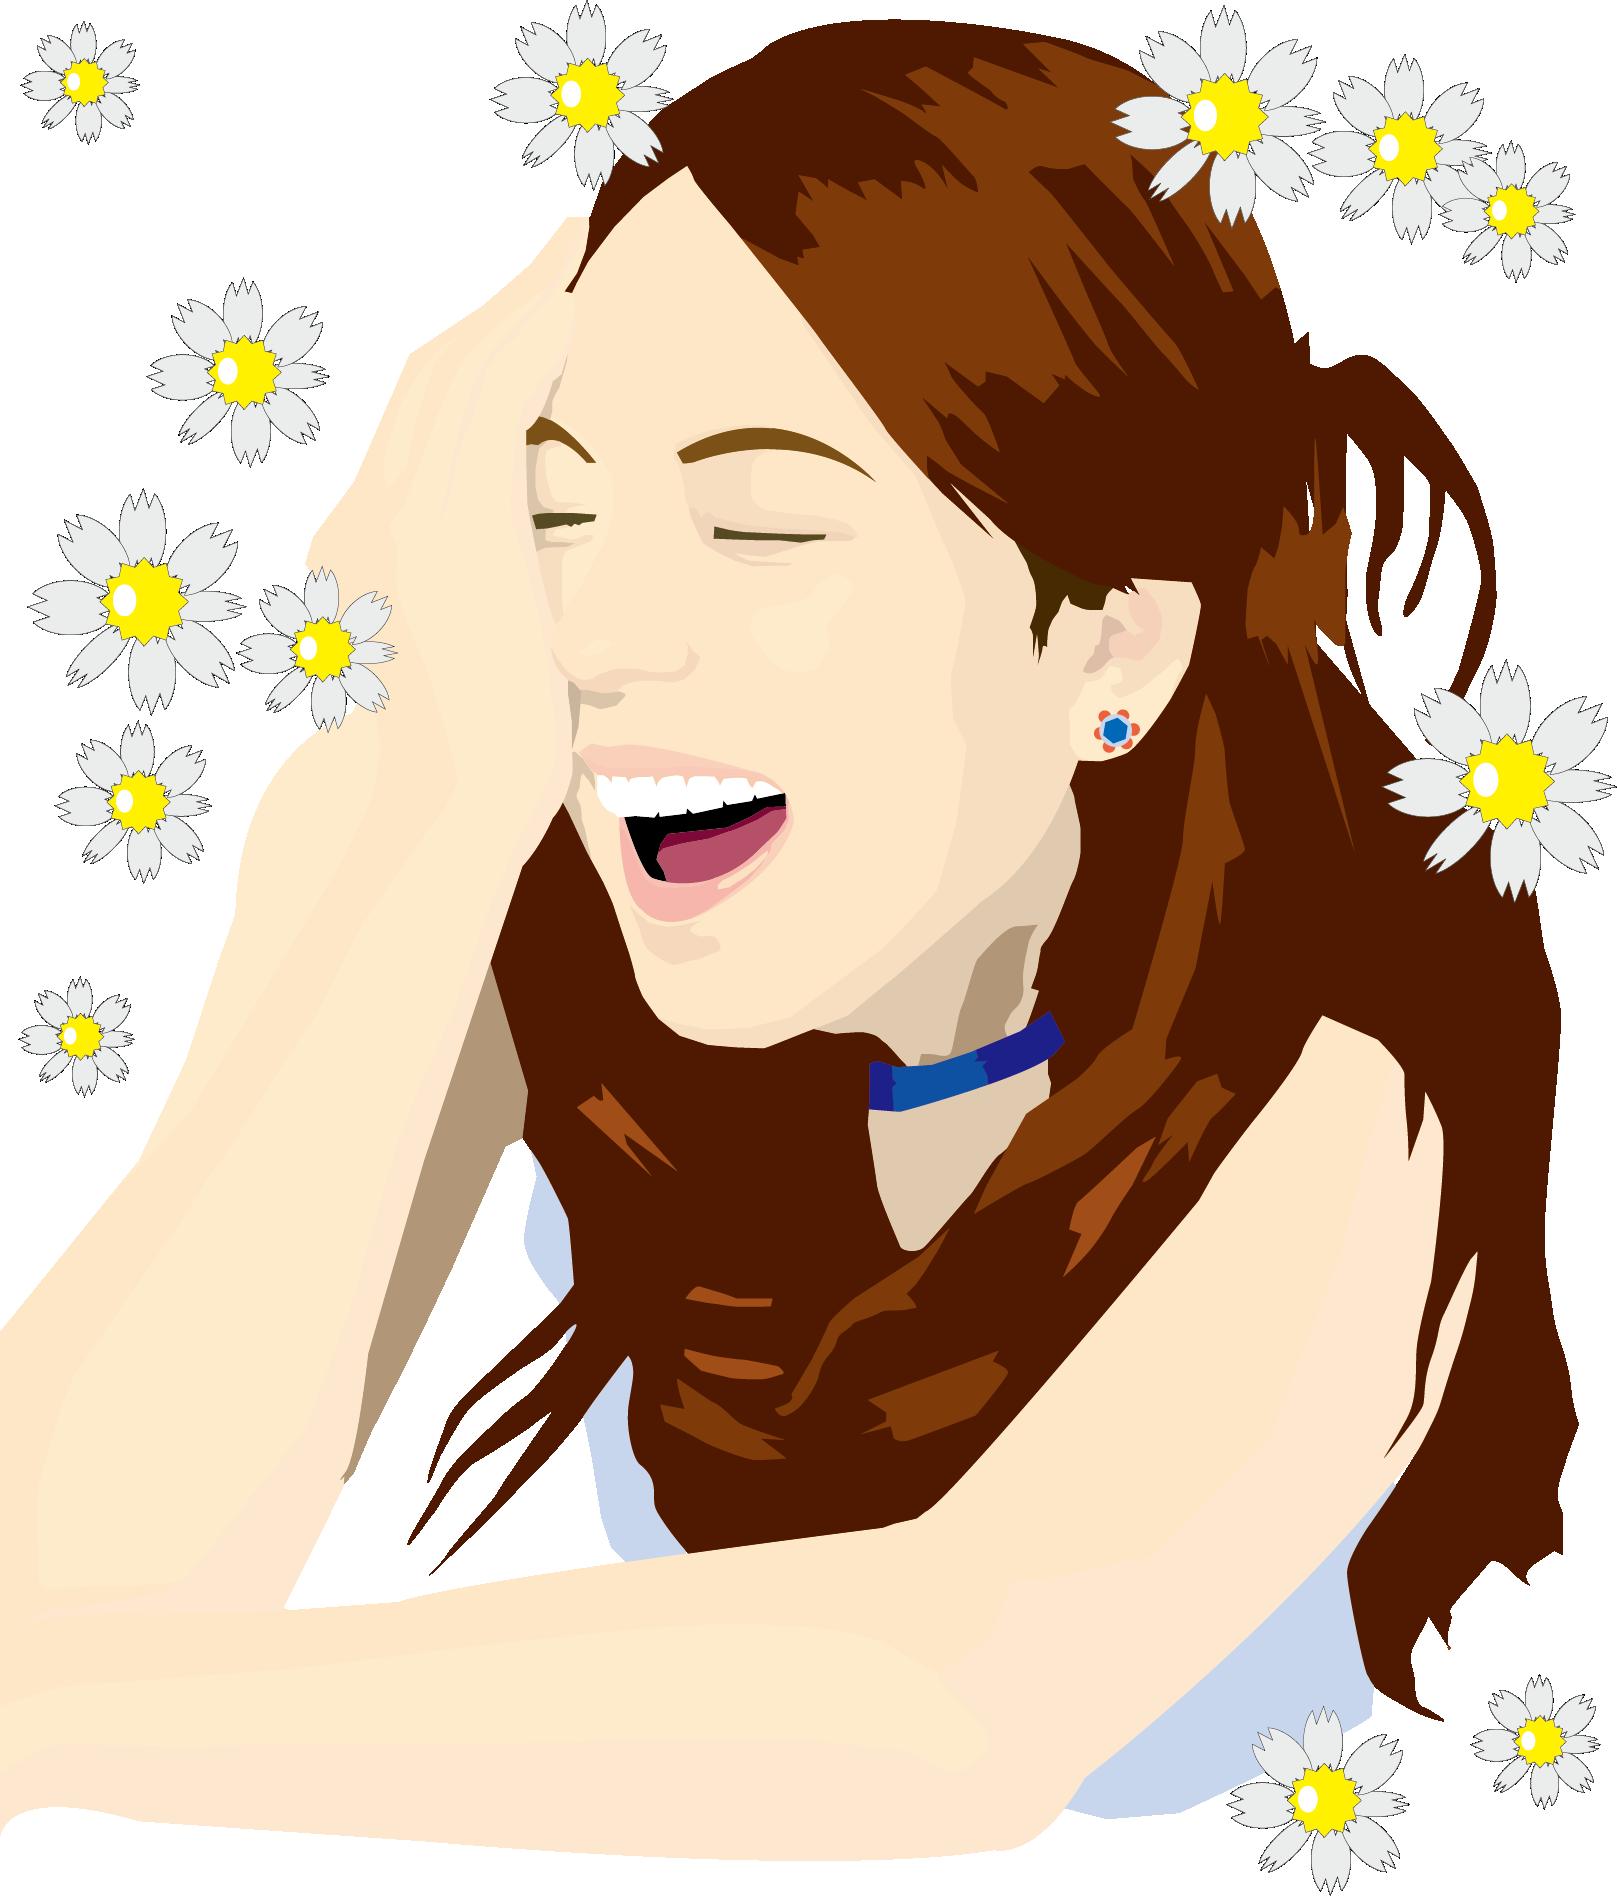 Skin clipart human skin. Face smile woman clip